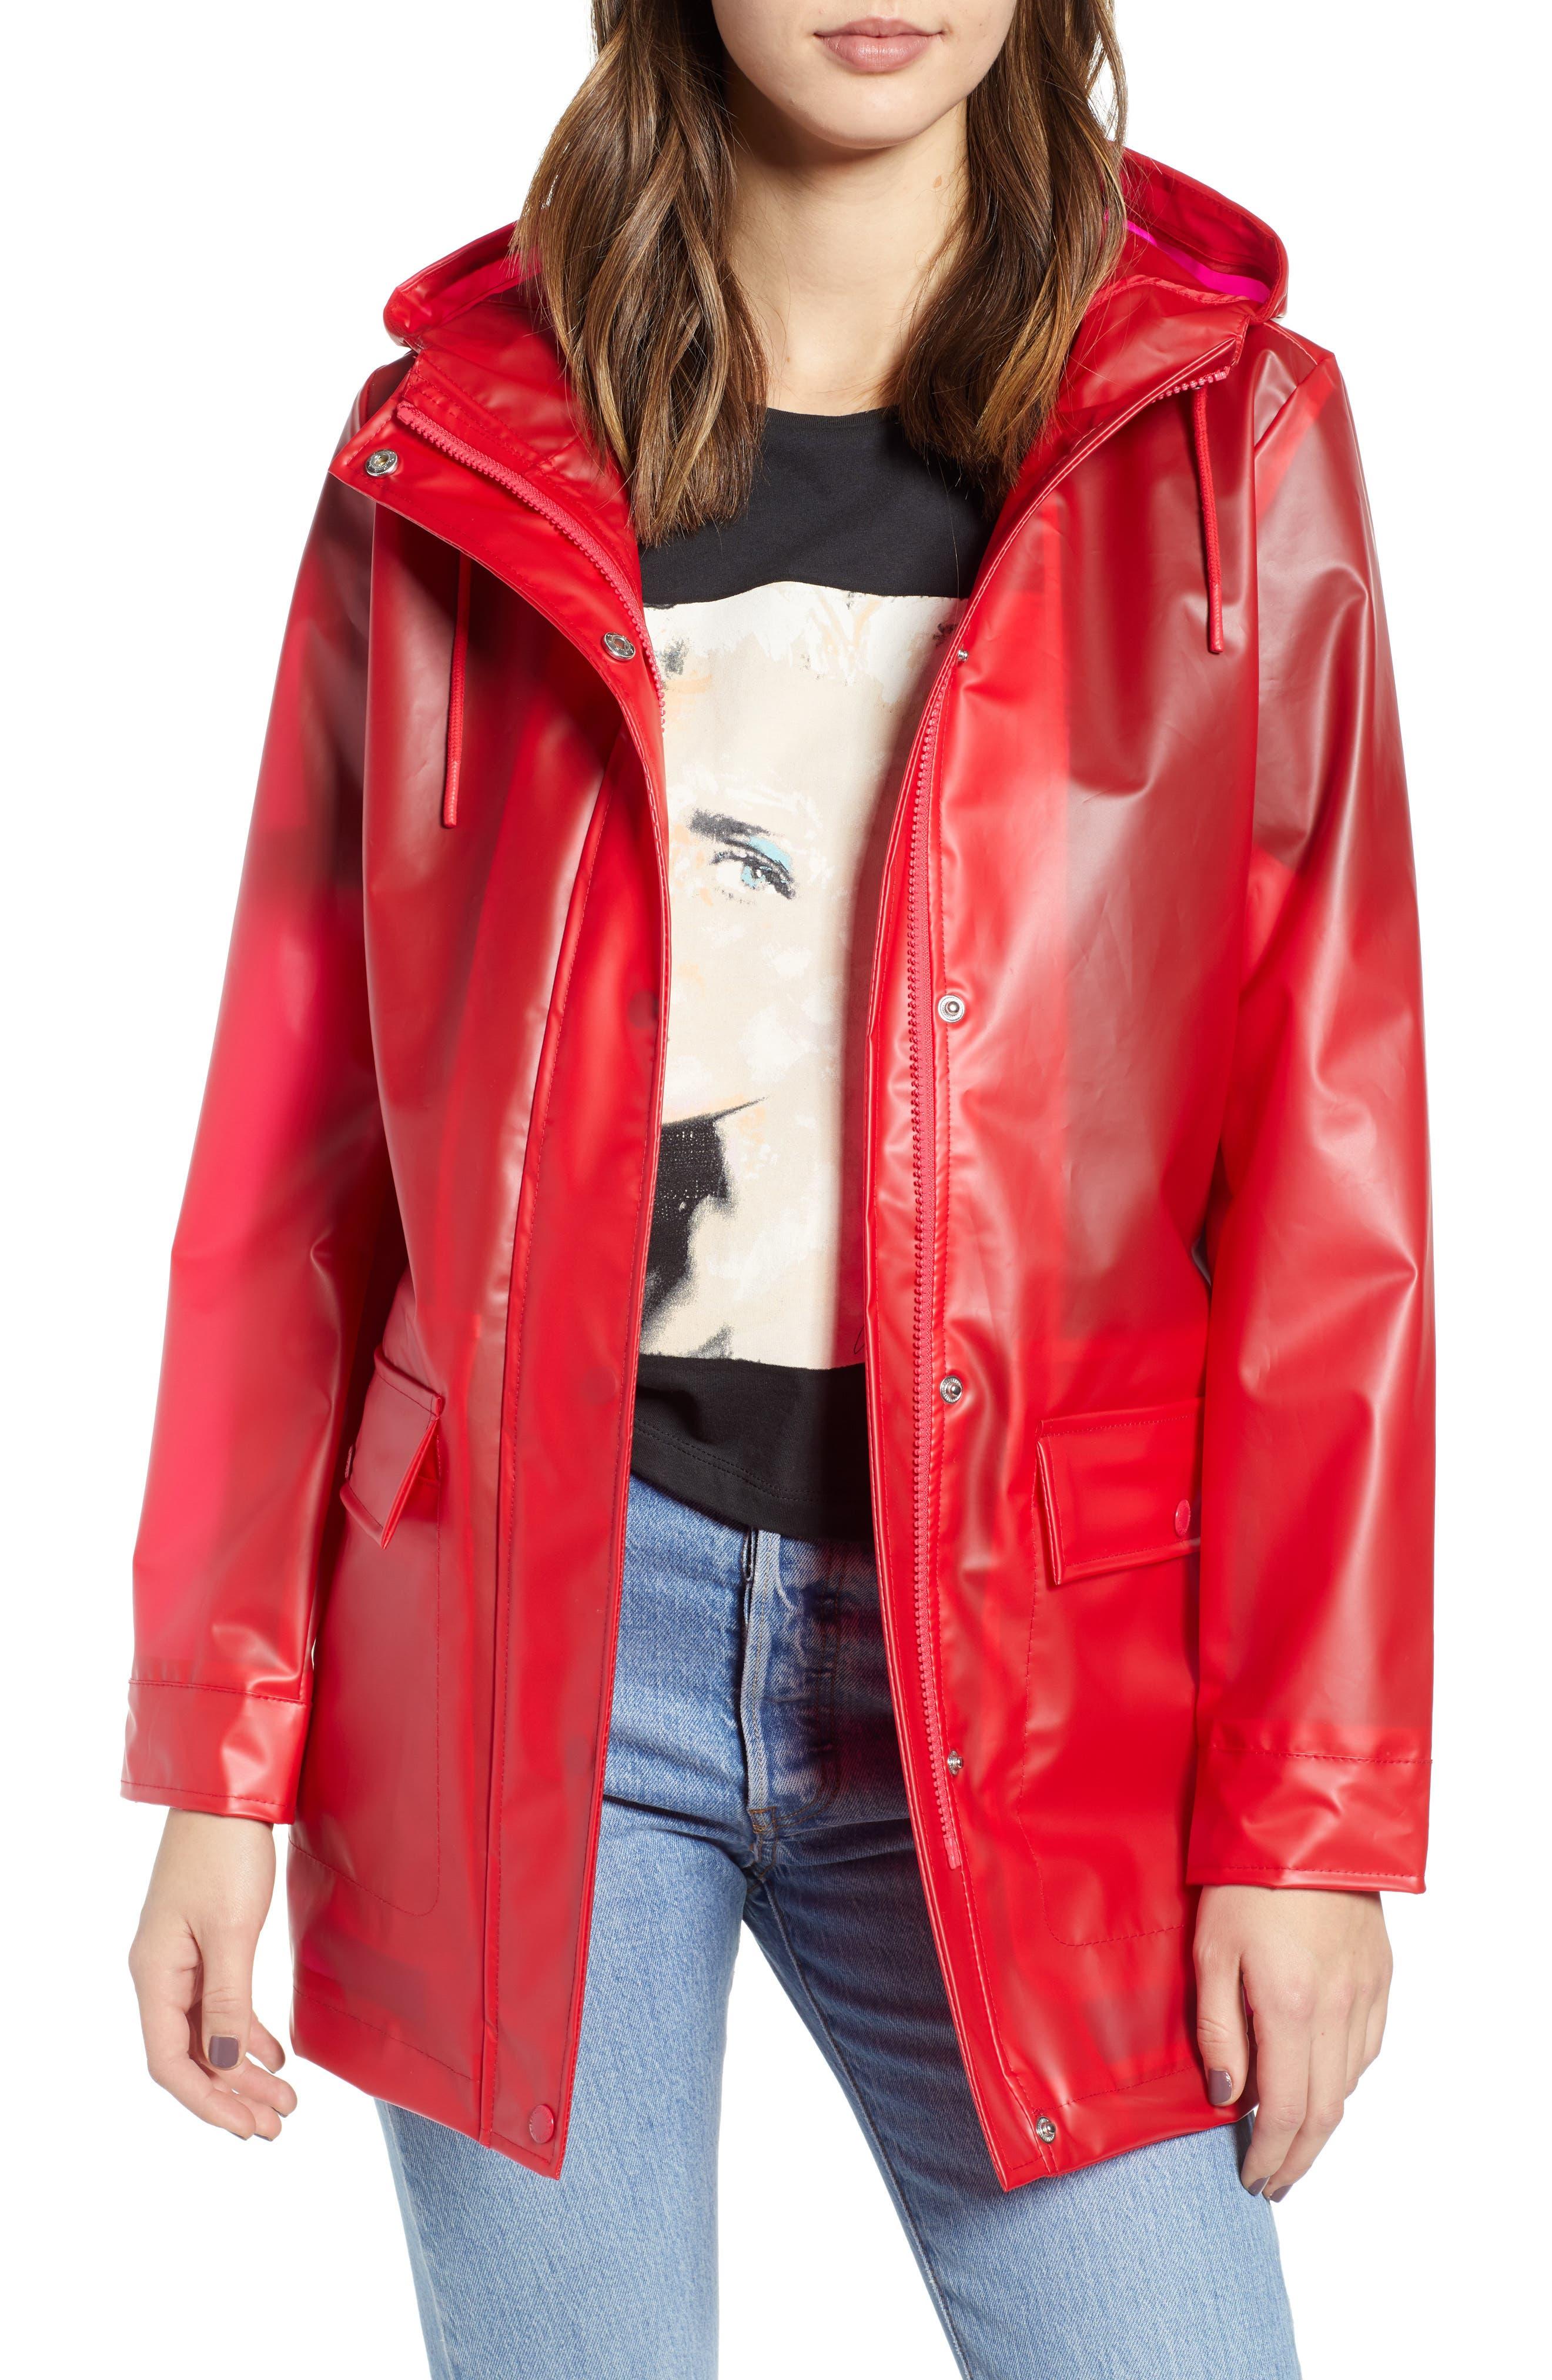 Translucent Rain Jacket,                             Main thumbnail 1, color,                             RED LYCHEE